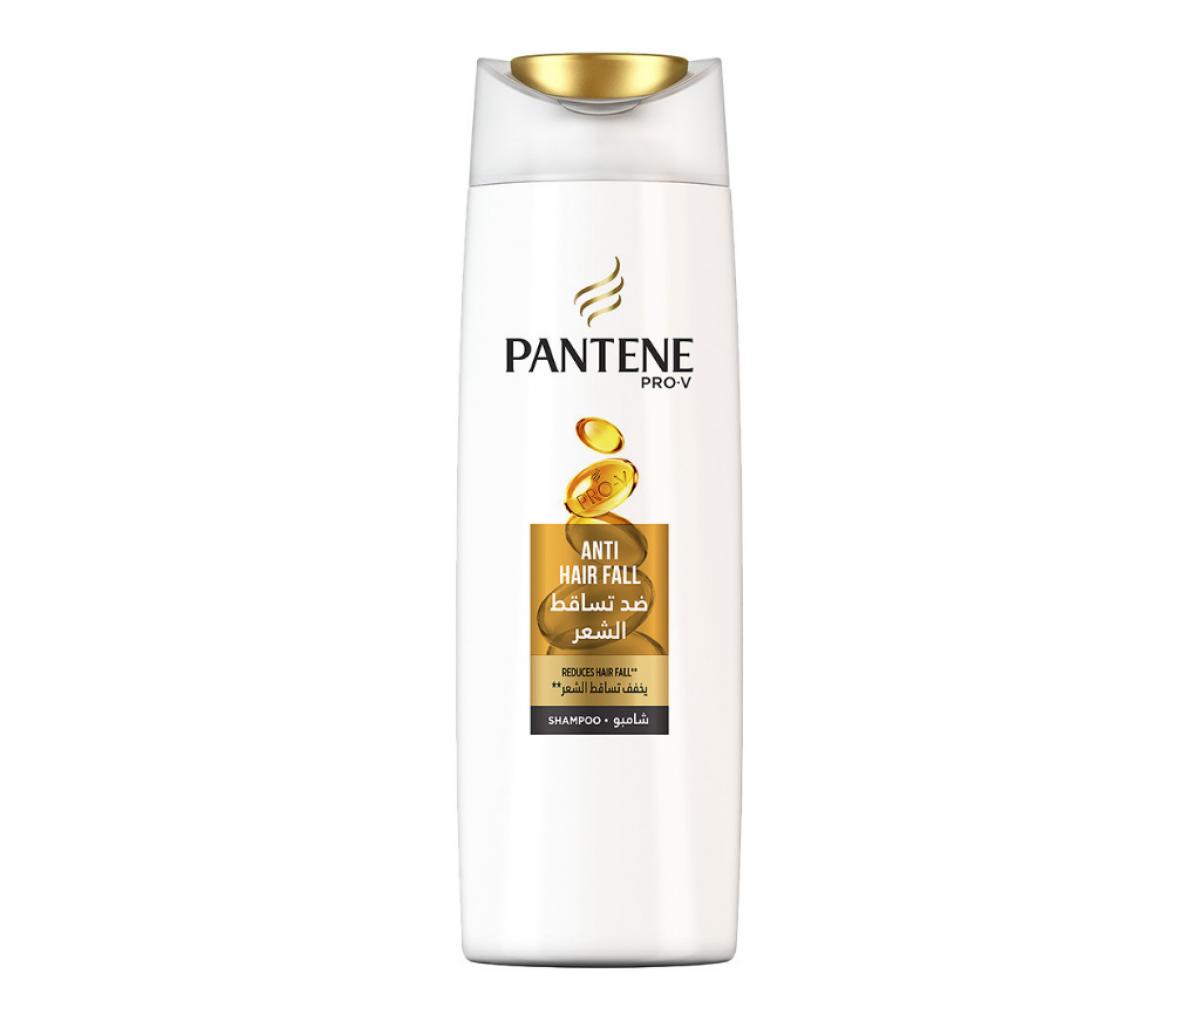 Pantene Shampoo 400ml Anti Hairfall